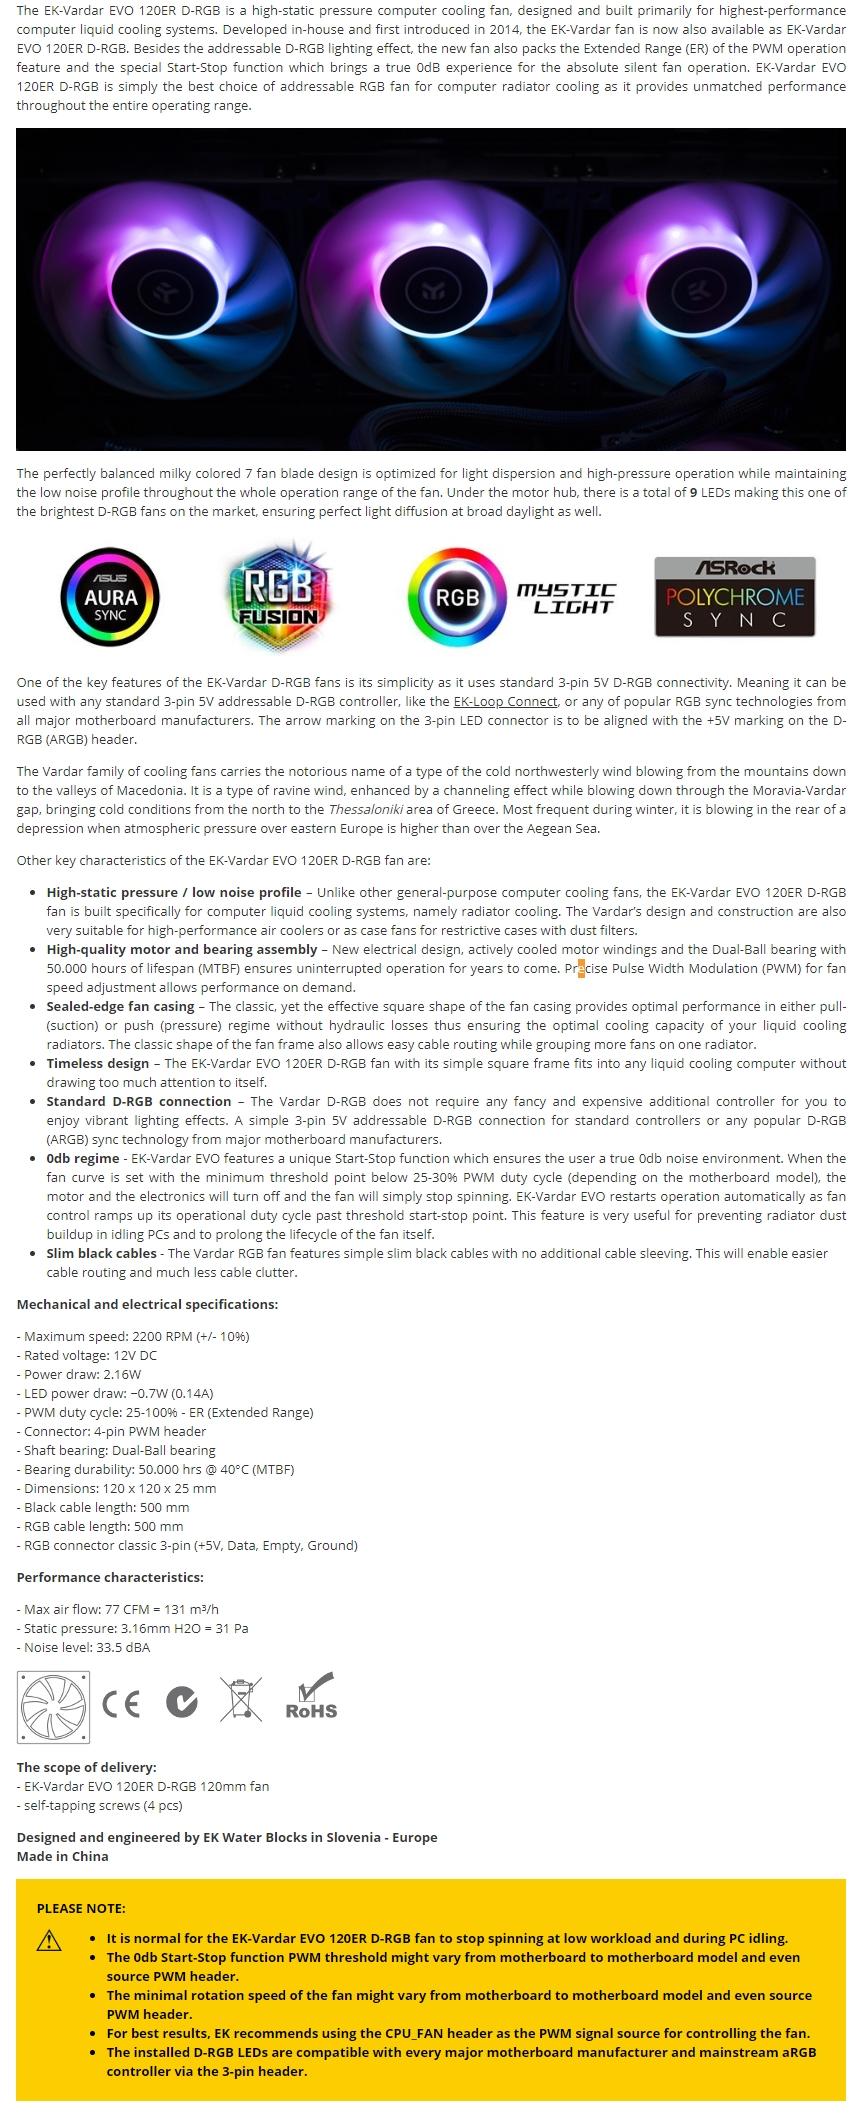 A large marketing image providing additional information about the product EK-Vardar EVO D-RGB 120ER 120mm Addressable RGB Fan - Additional alt info not provided